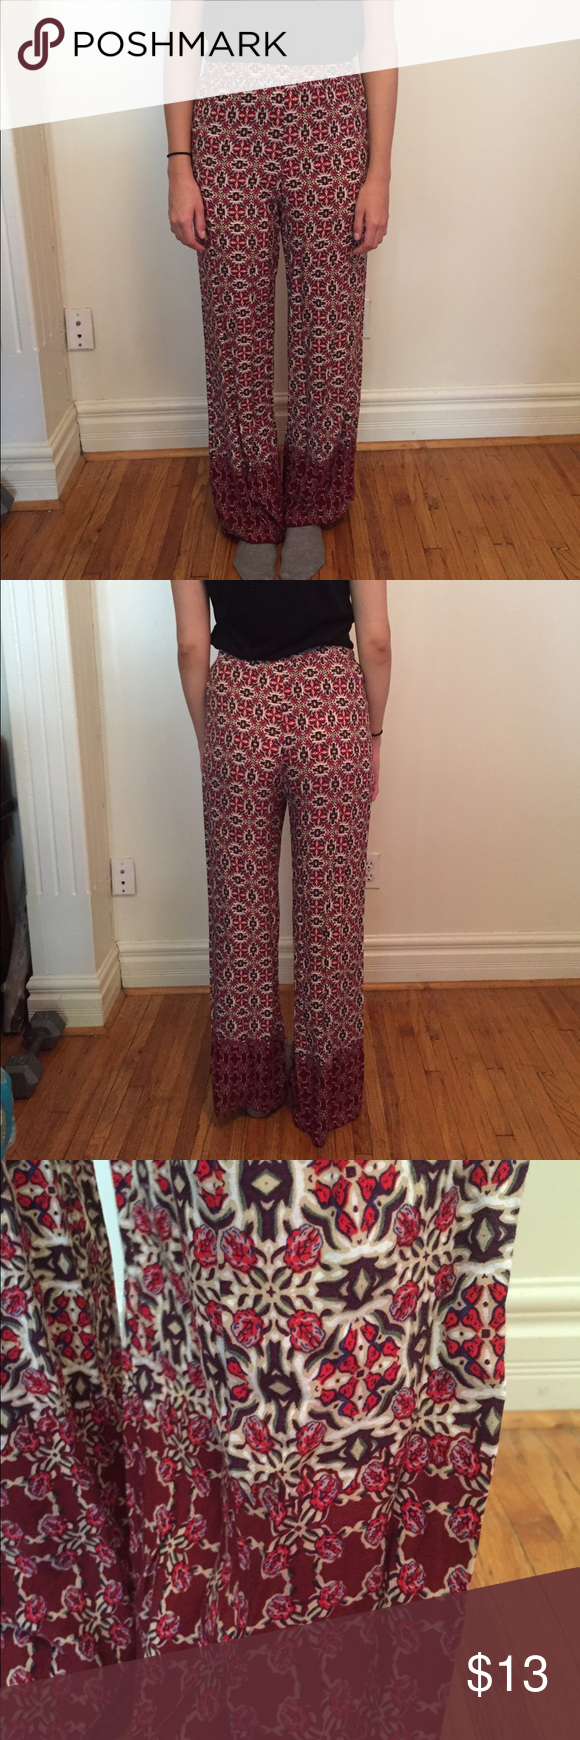 Patterned wide leg pants Elastic waist. Lightweight material. Forever 21 Pants Wide Leg